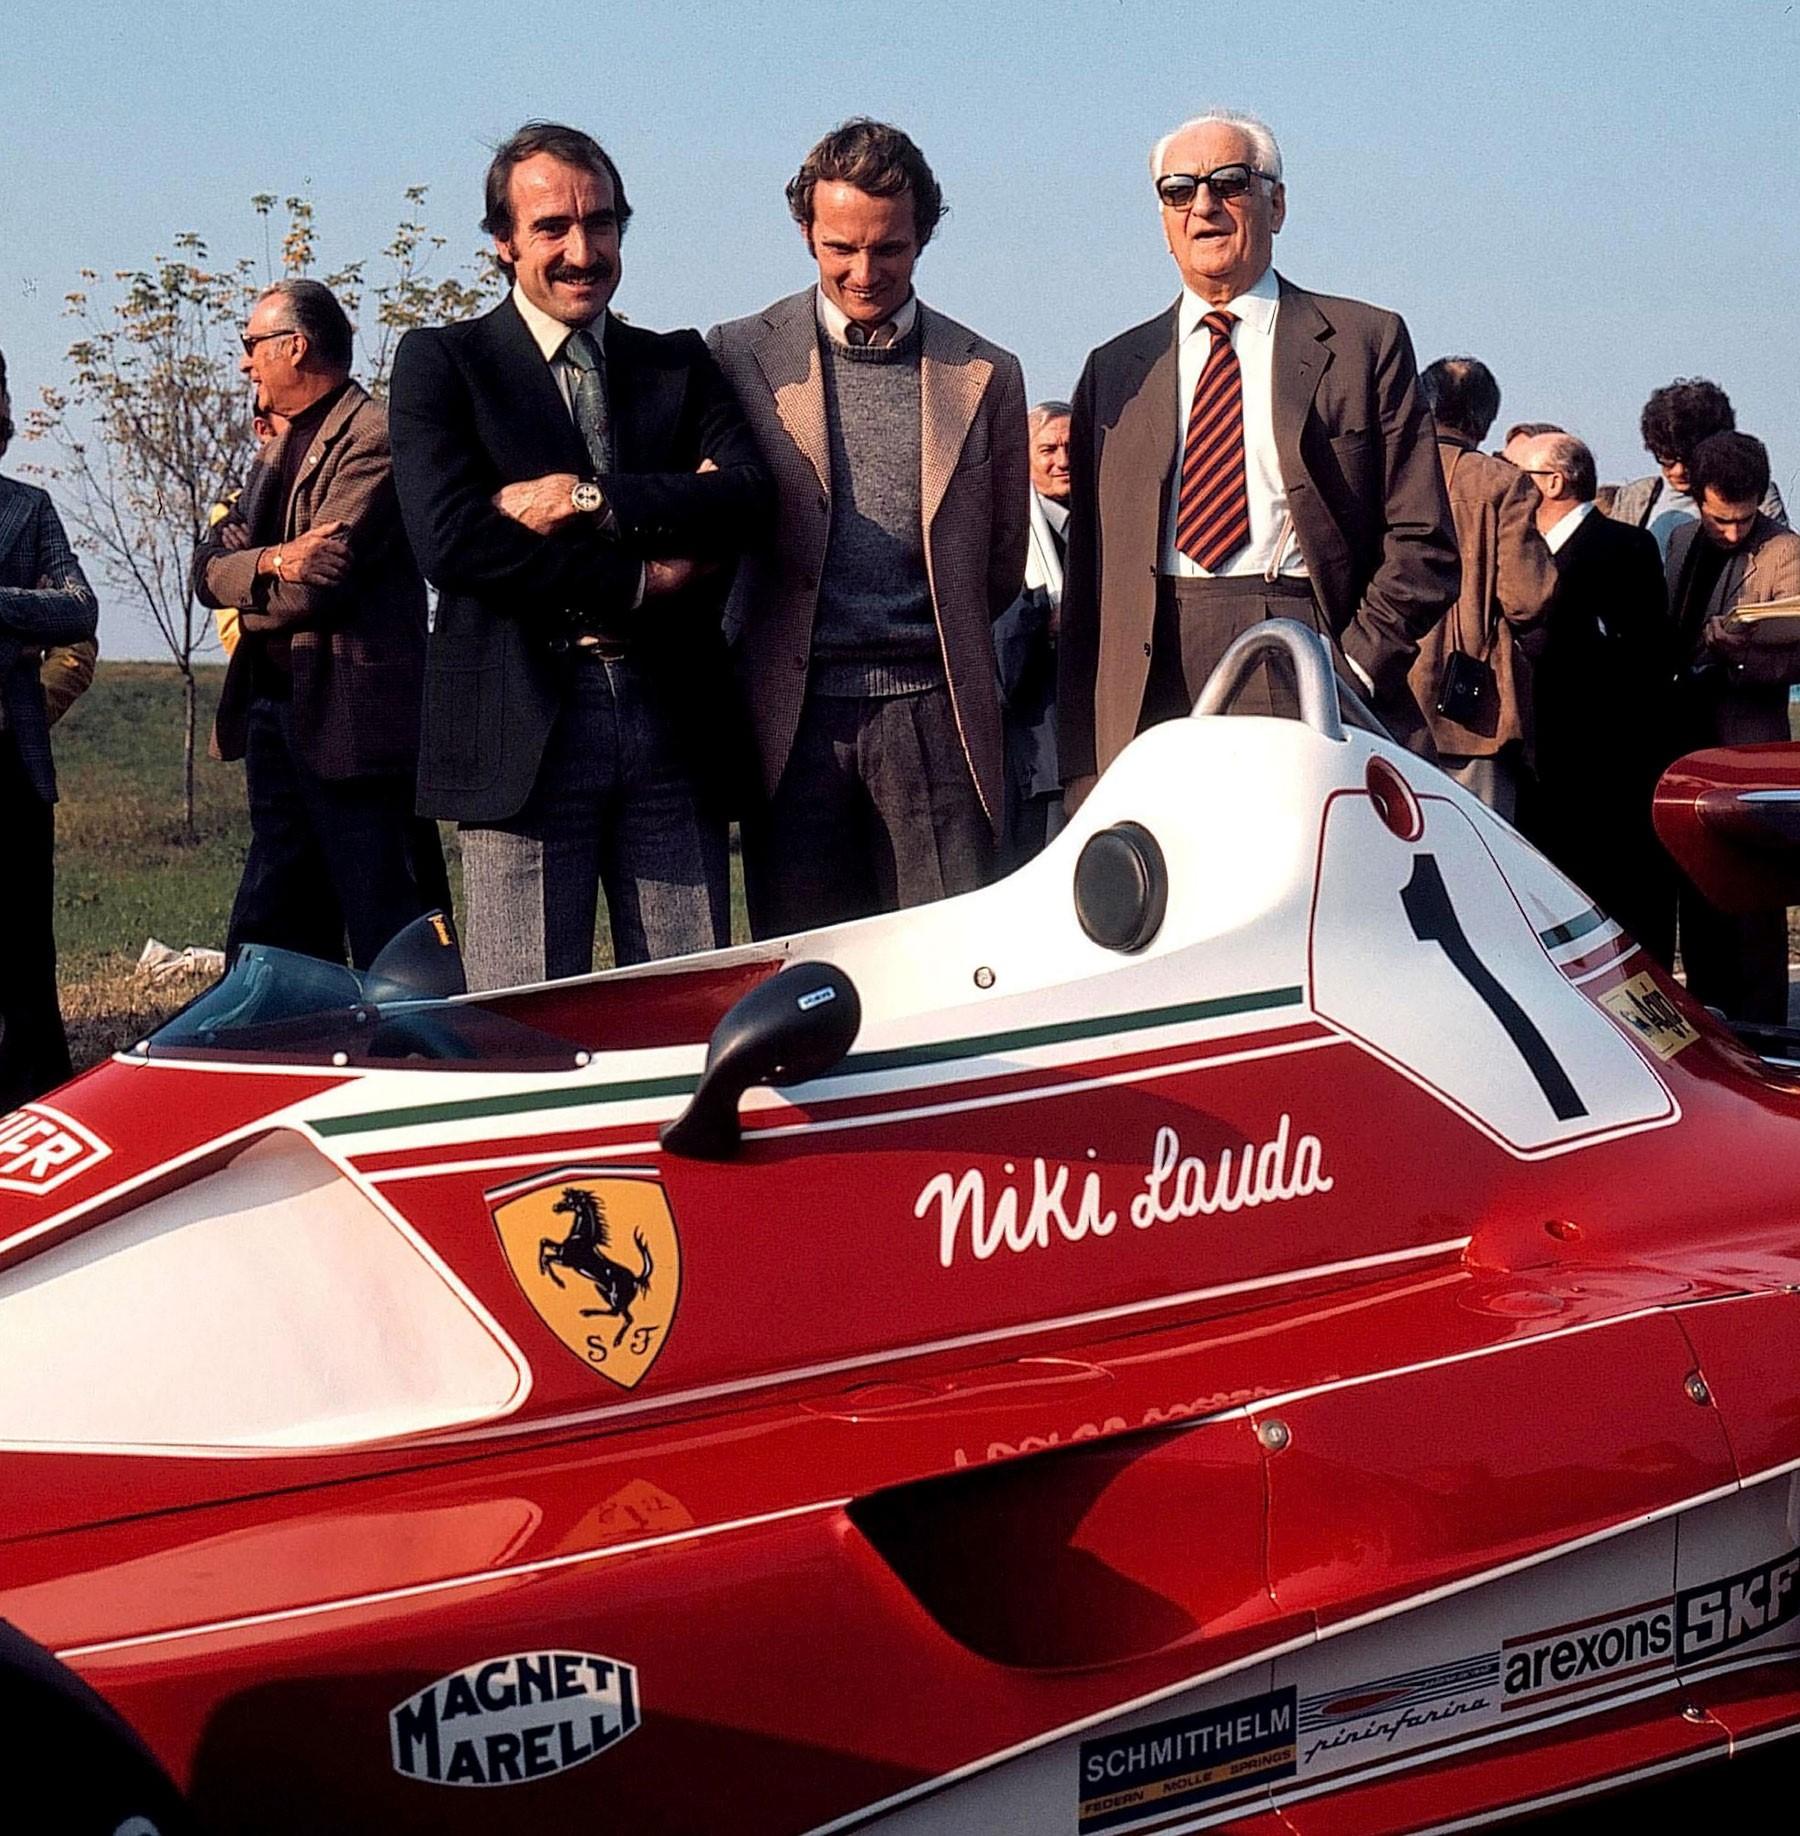 1975 World Championship Winning Car